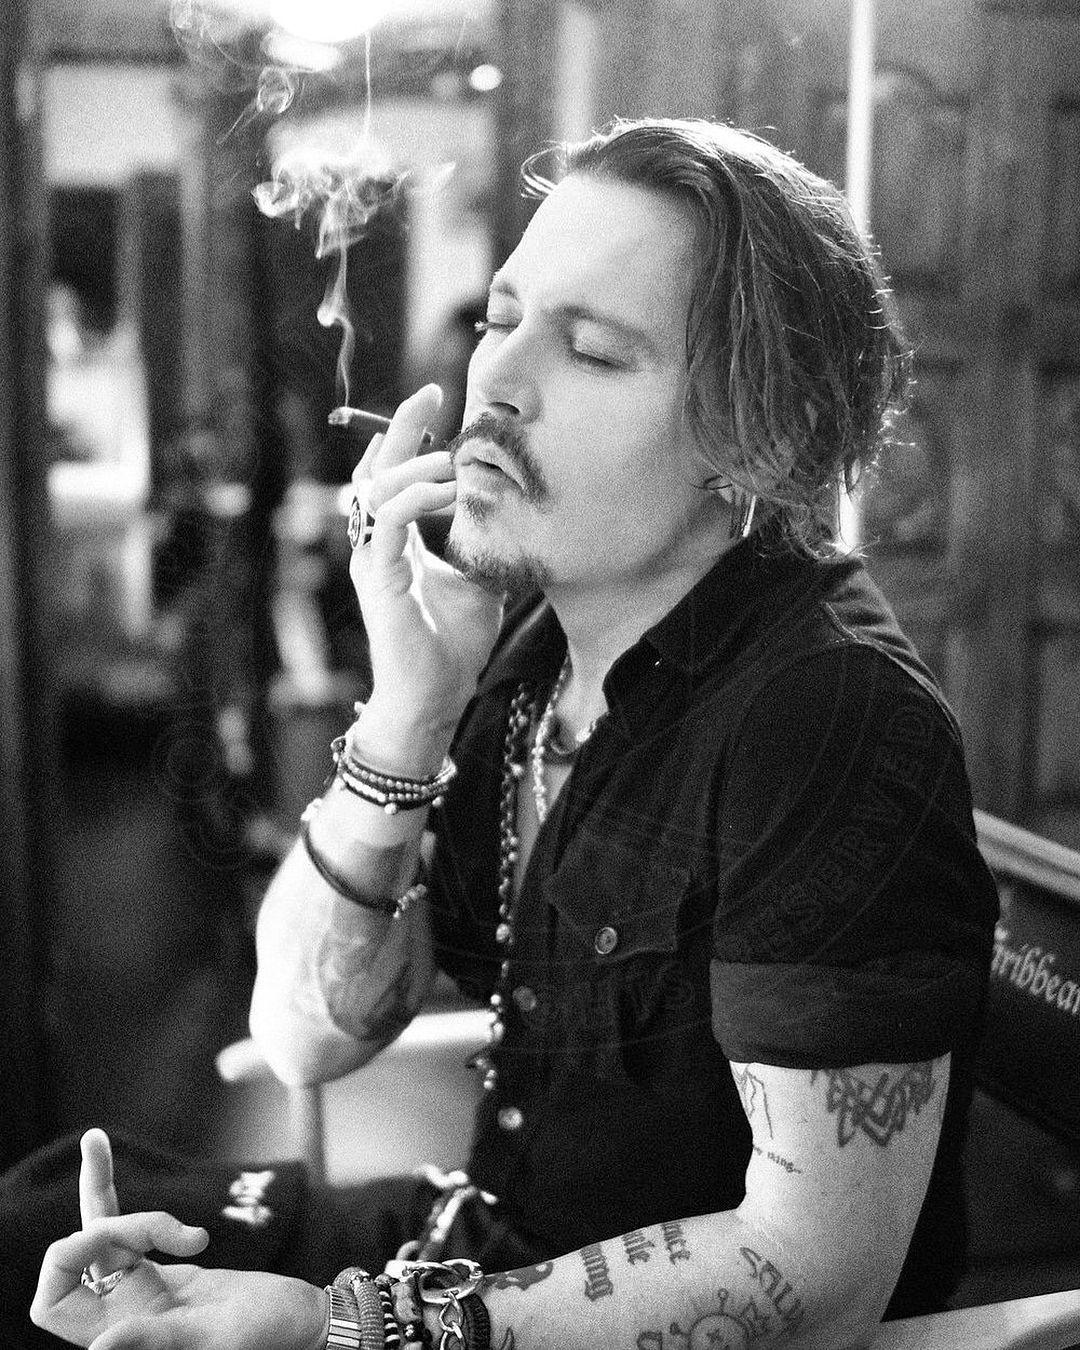 How to resurrect Johnny Depp's career